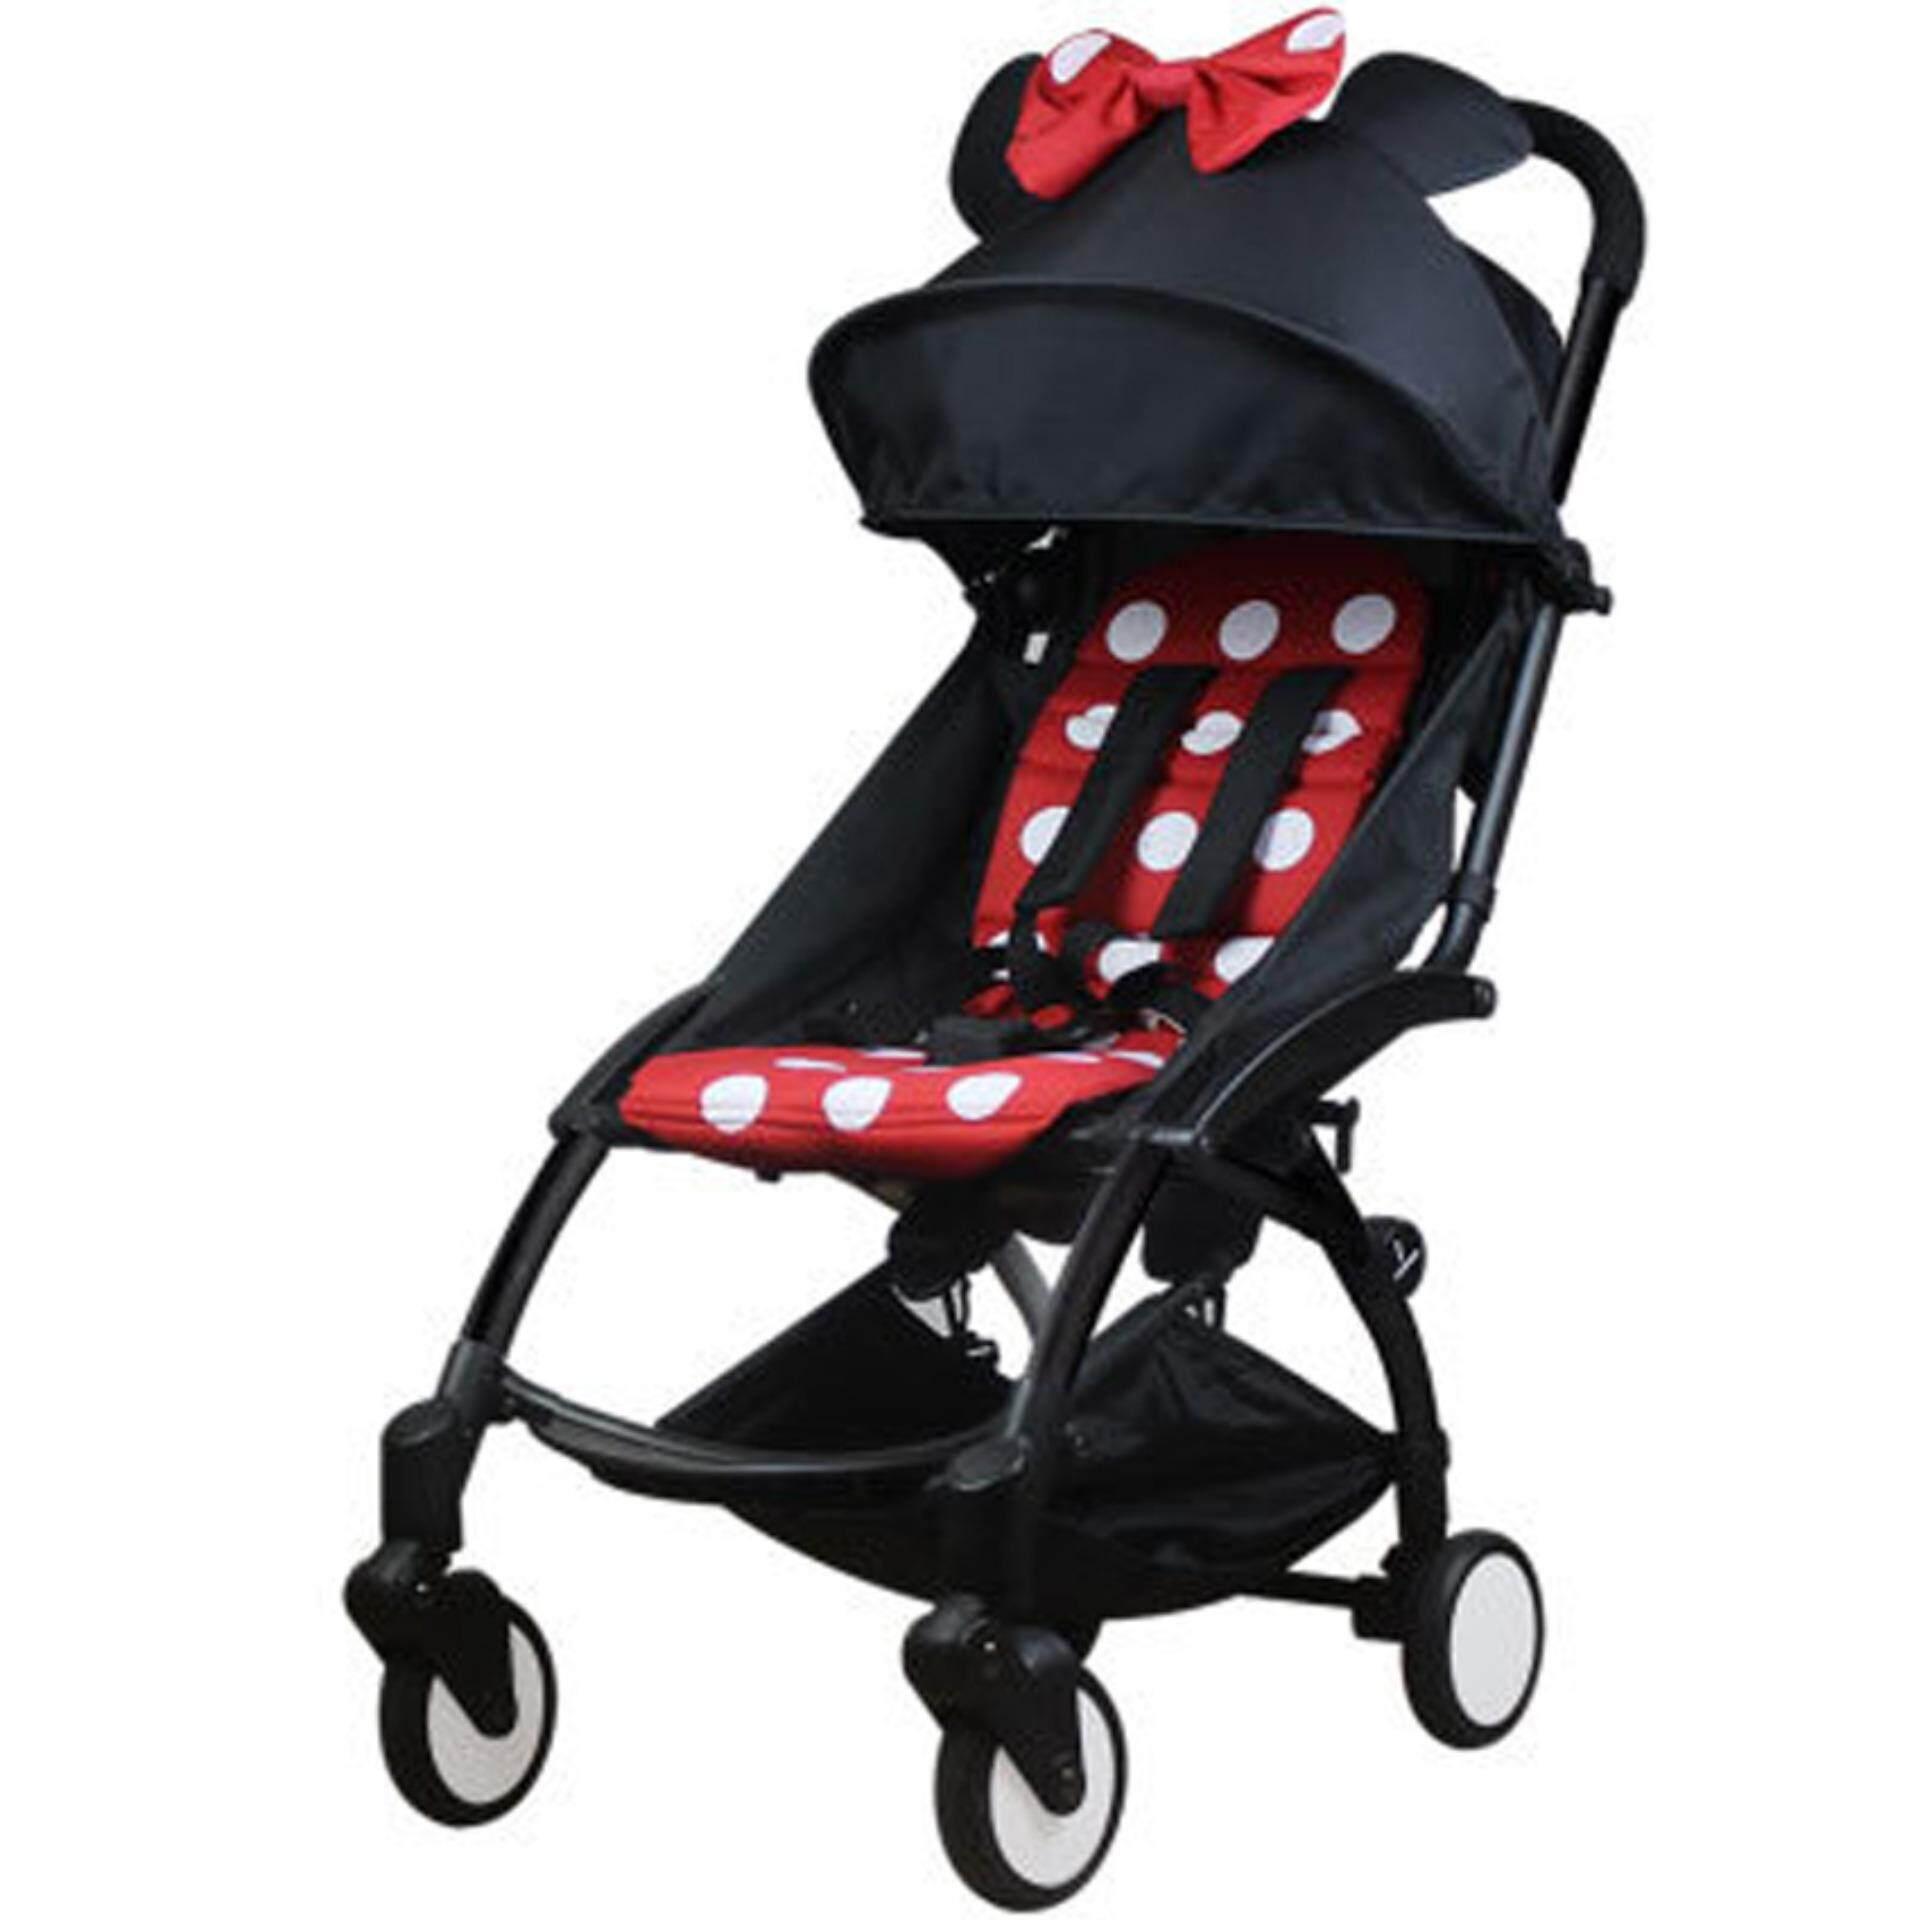 Sale ส่งท้ายปีท็อป 1 ดีที่สุด Unbranded/Generic รถเข็นเด็กแบบนอน Baby Stroller Wisesonle ( KHAKI ) รถเข็นเด็กน้ำหนักเบา 4.8kg กางพับเก็บง่ายพกพาสะดวกโครงสร้างแข็งแรงเป็นพิเศษรับน้ำหนักได้ 25Kg. รูปทรงสีสันสวยงามน่าใช้ ช่องใส่ของขนาดใหญ่ด้านล่าง สีน้ำตาล ซื้อที่ไหน ? ถูกที่สุด